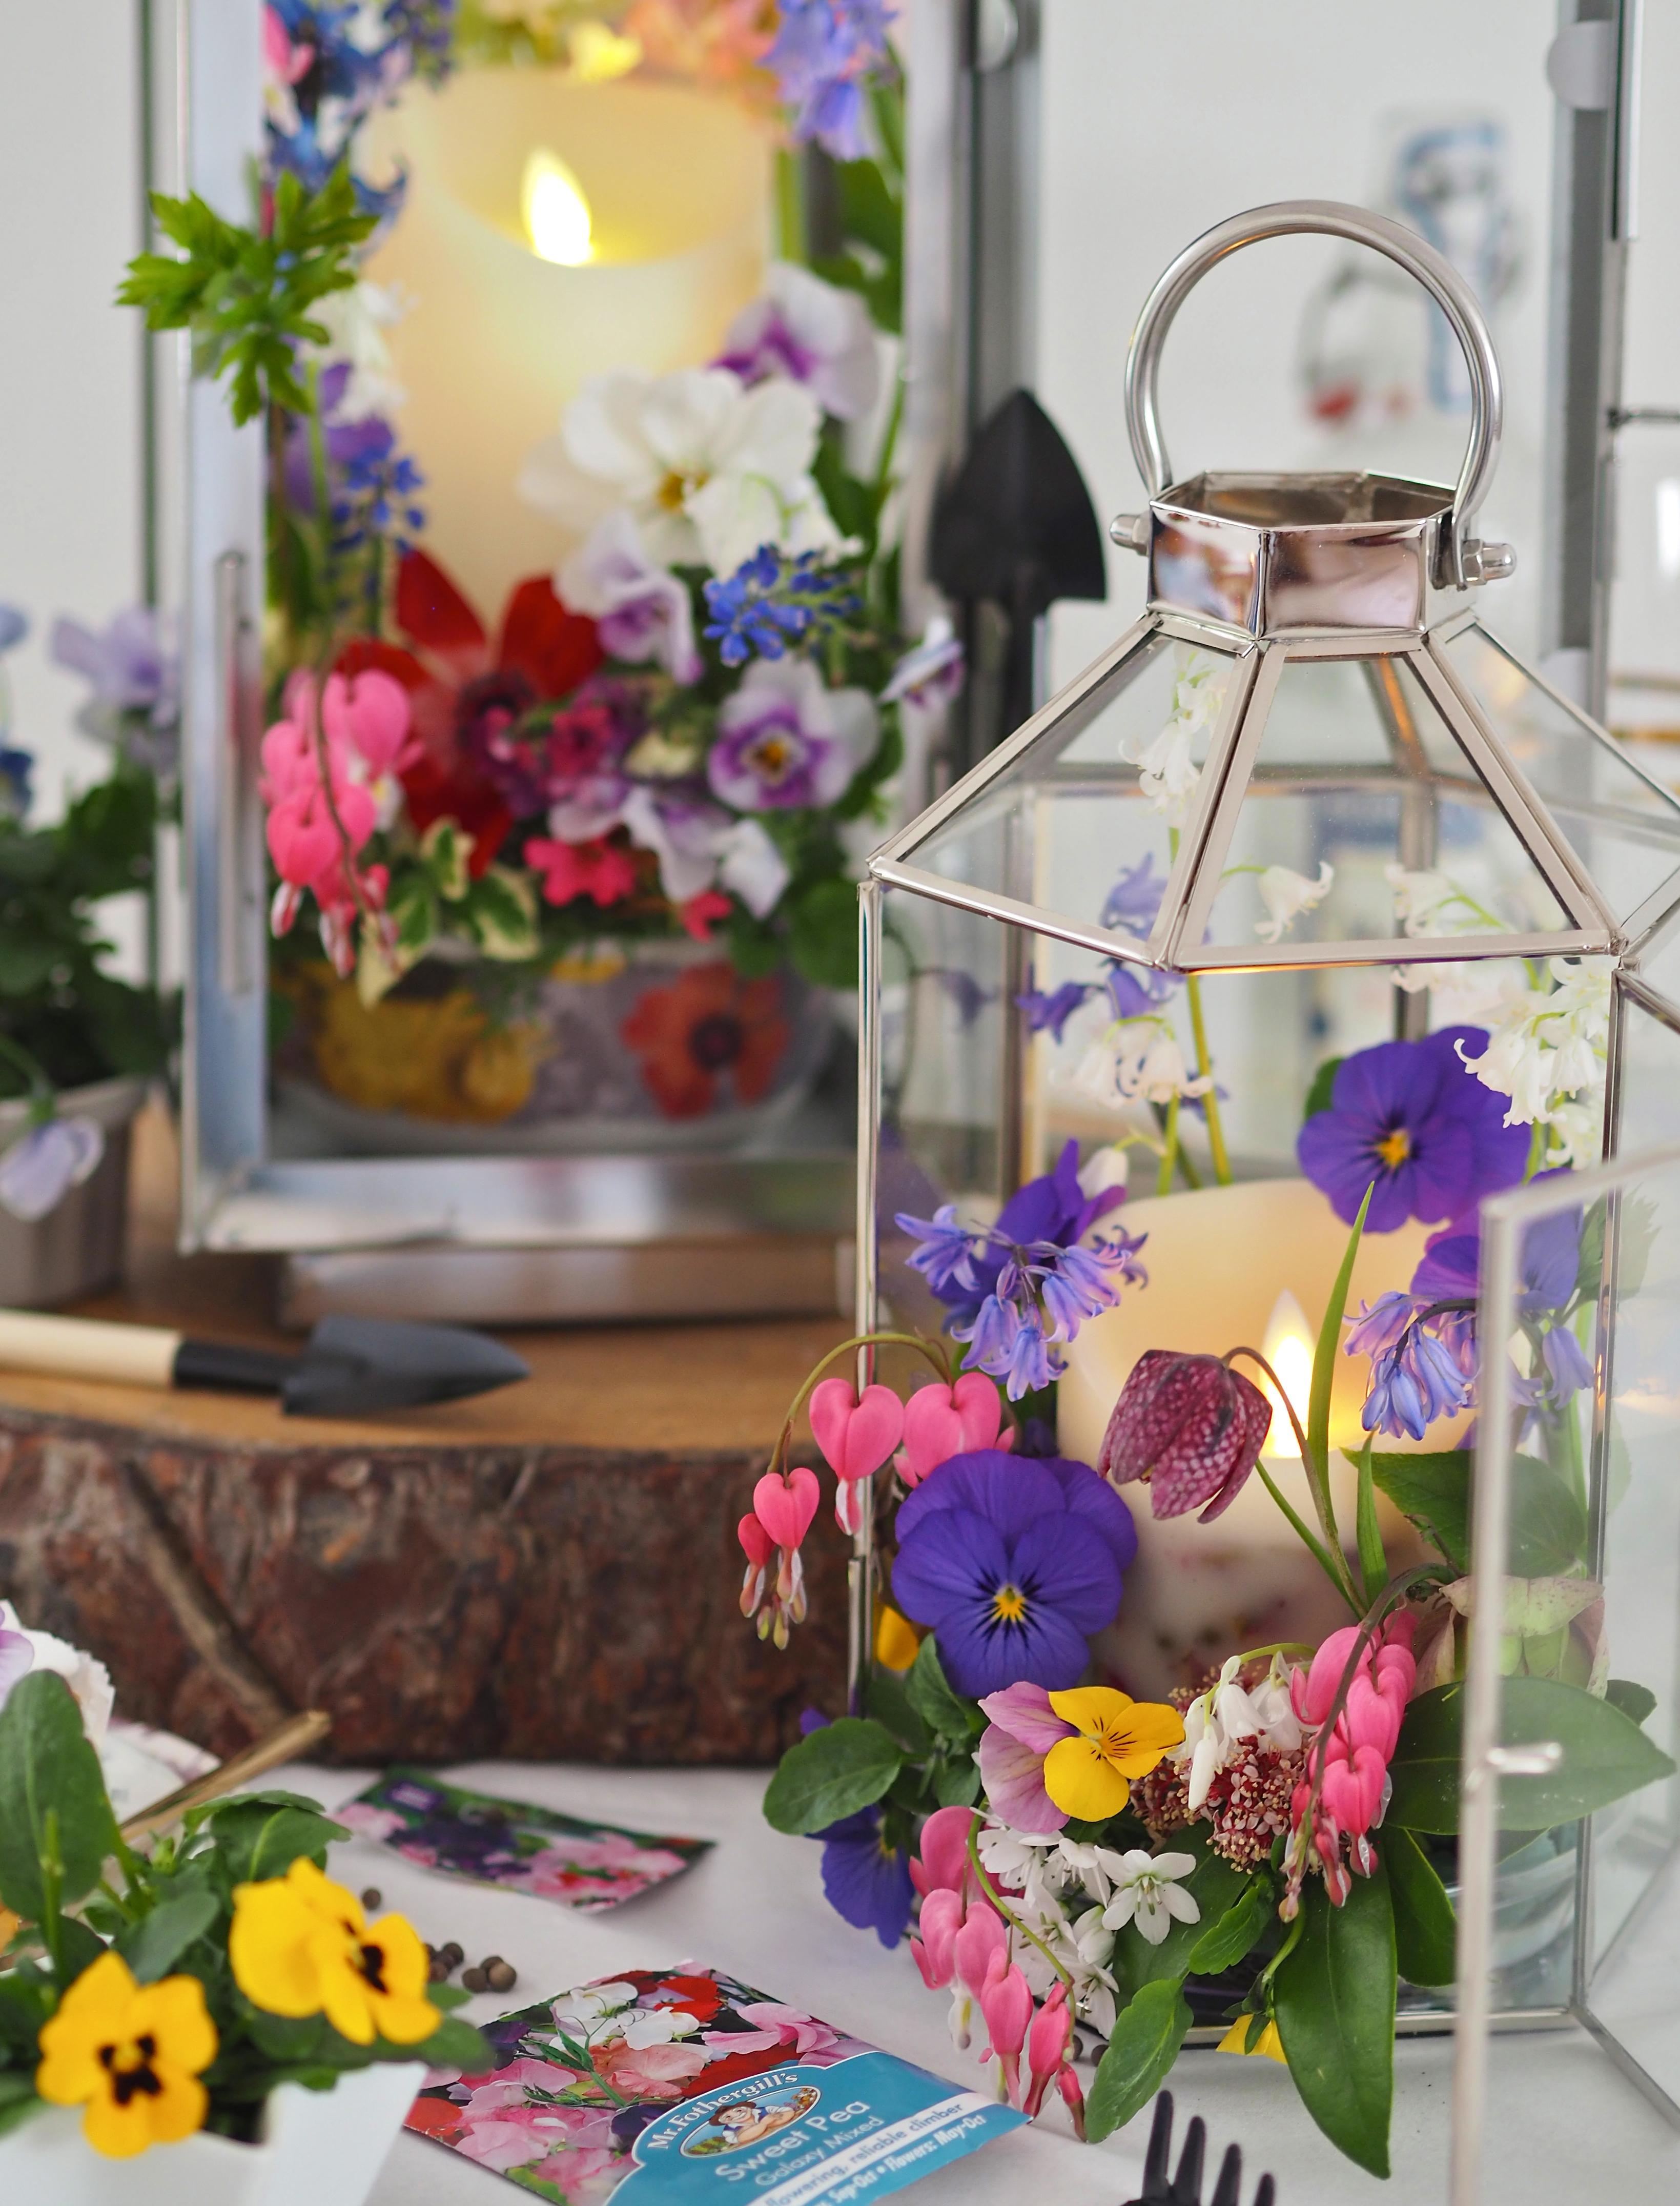 DIY Decorative Planted Lanterns jjj